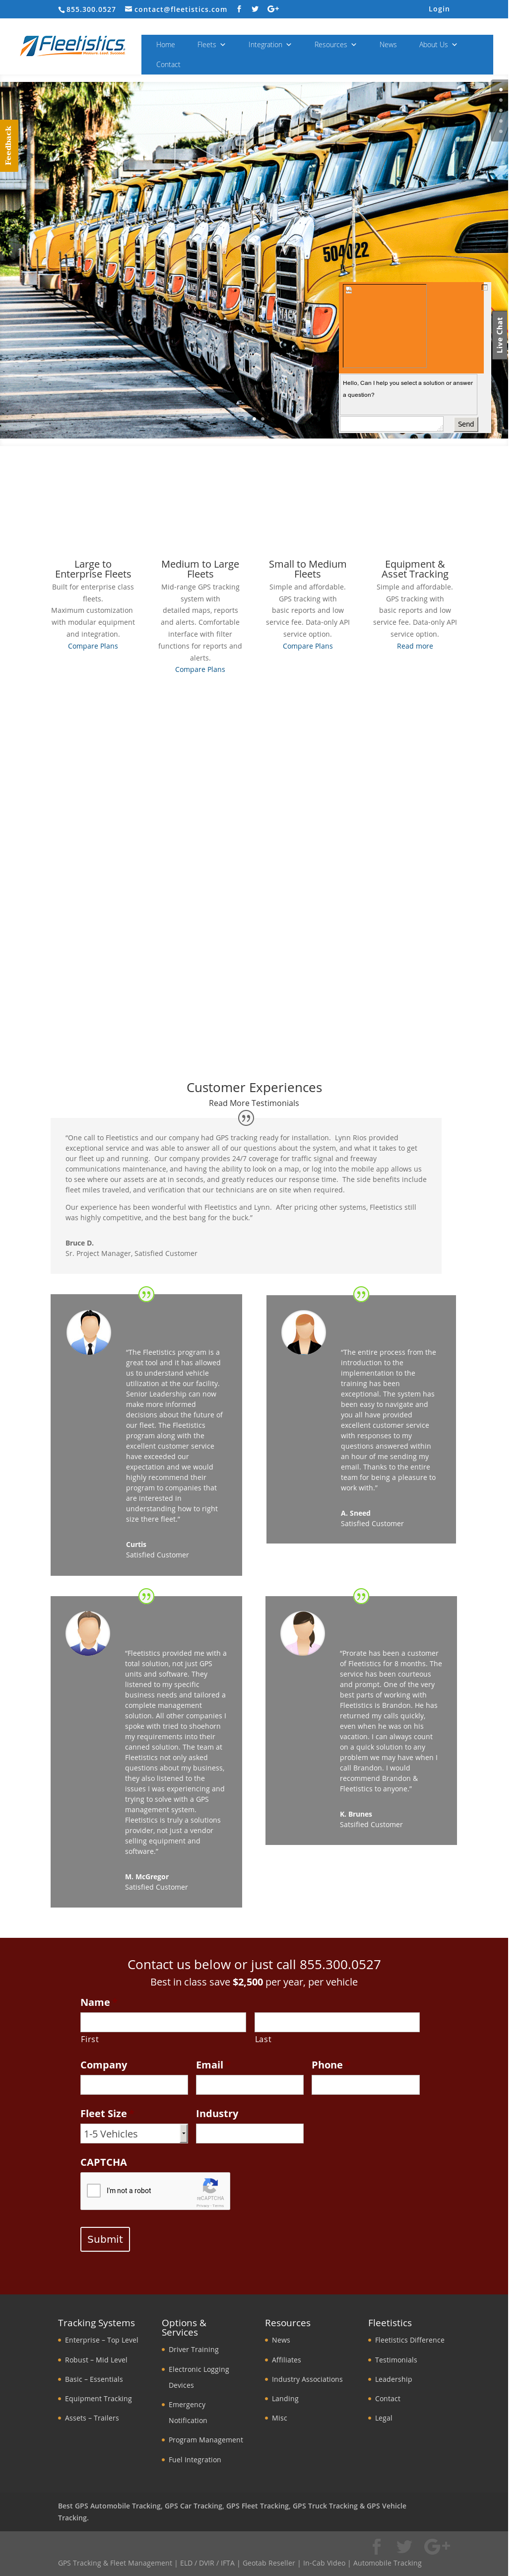 Fleetistics Competitors, Revenue and Employees - Owler